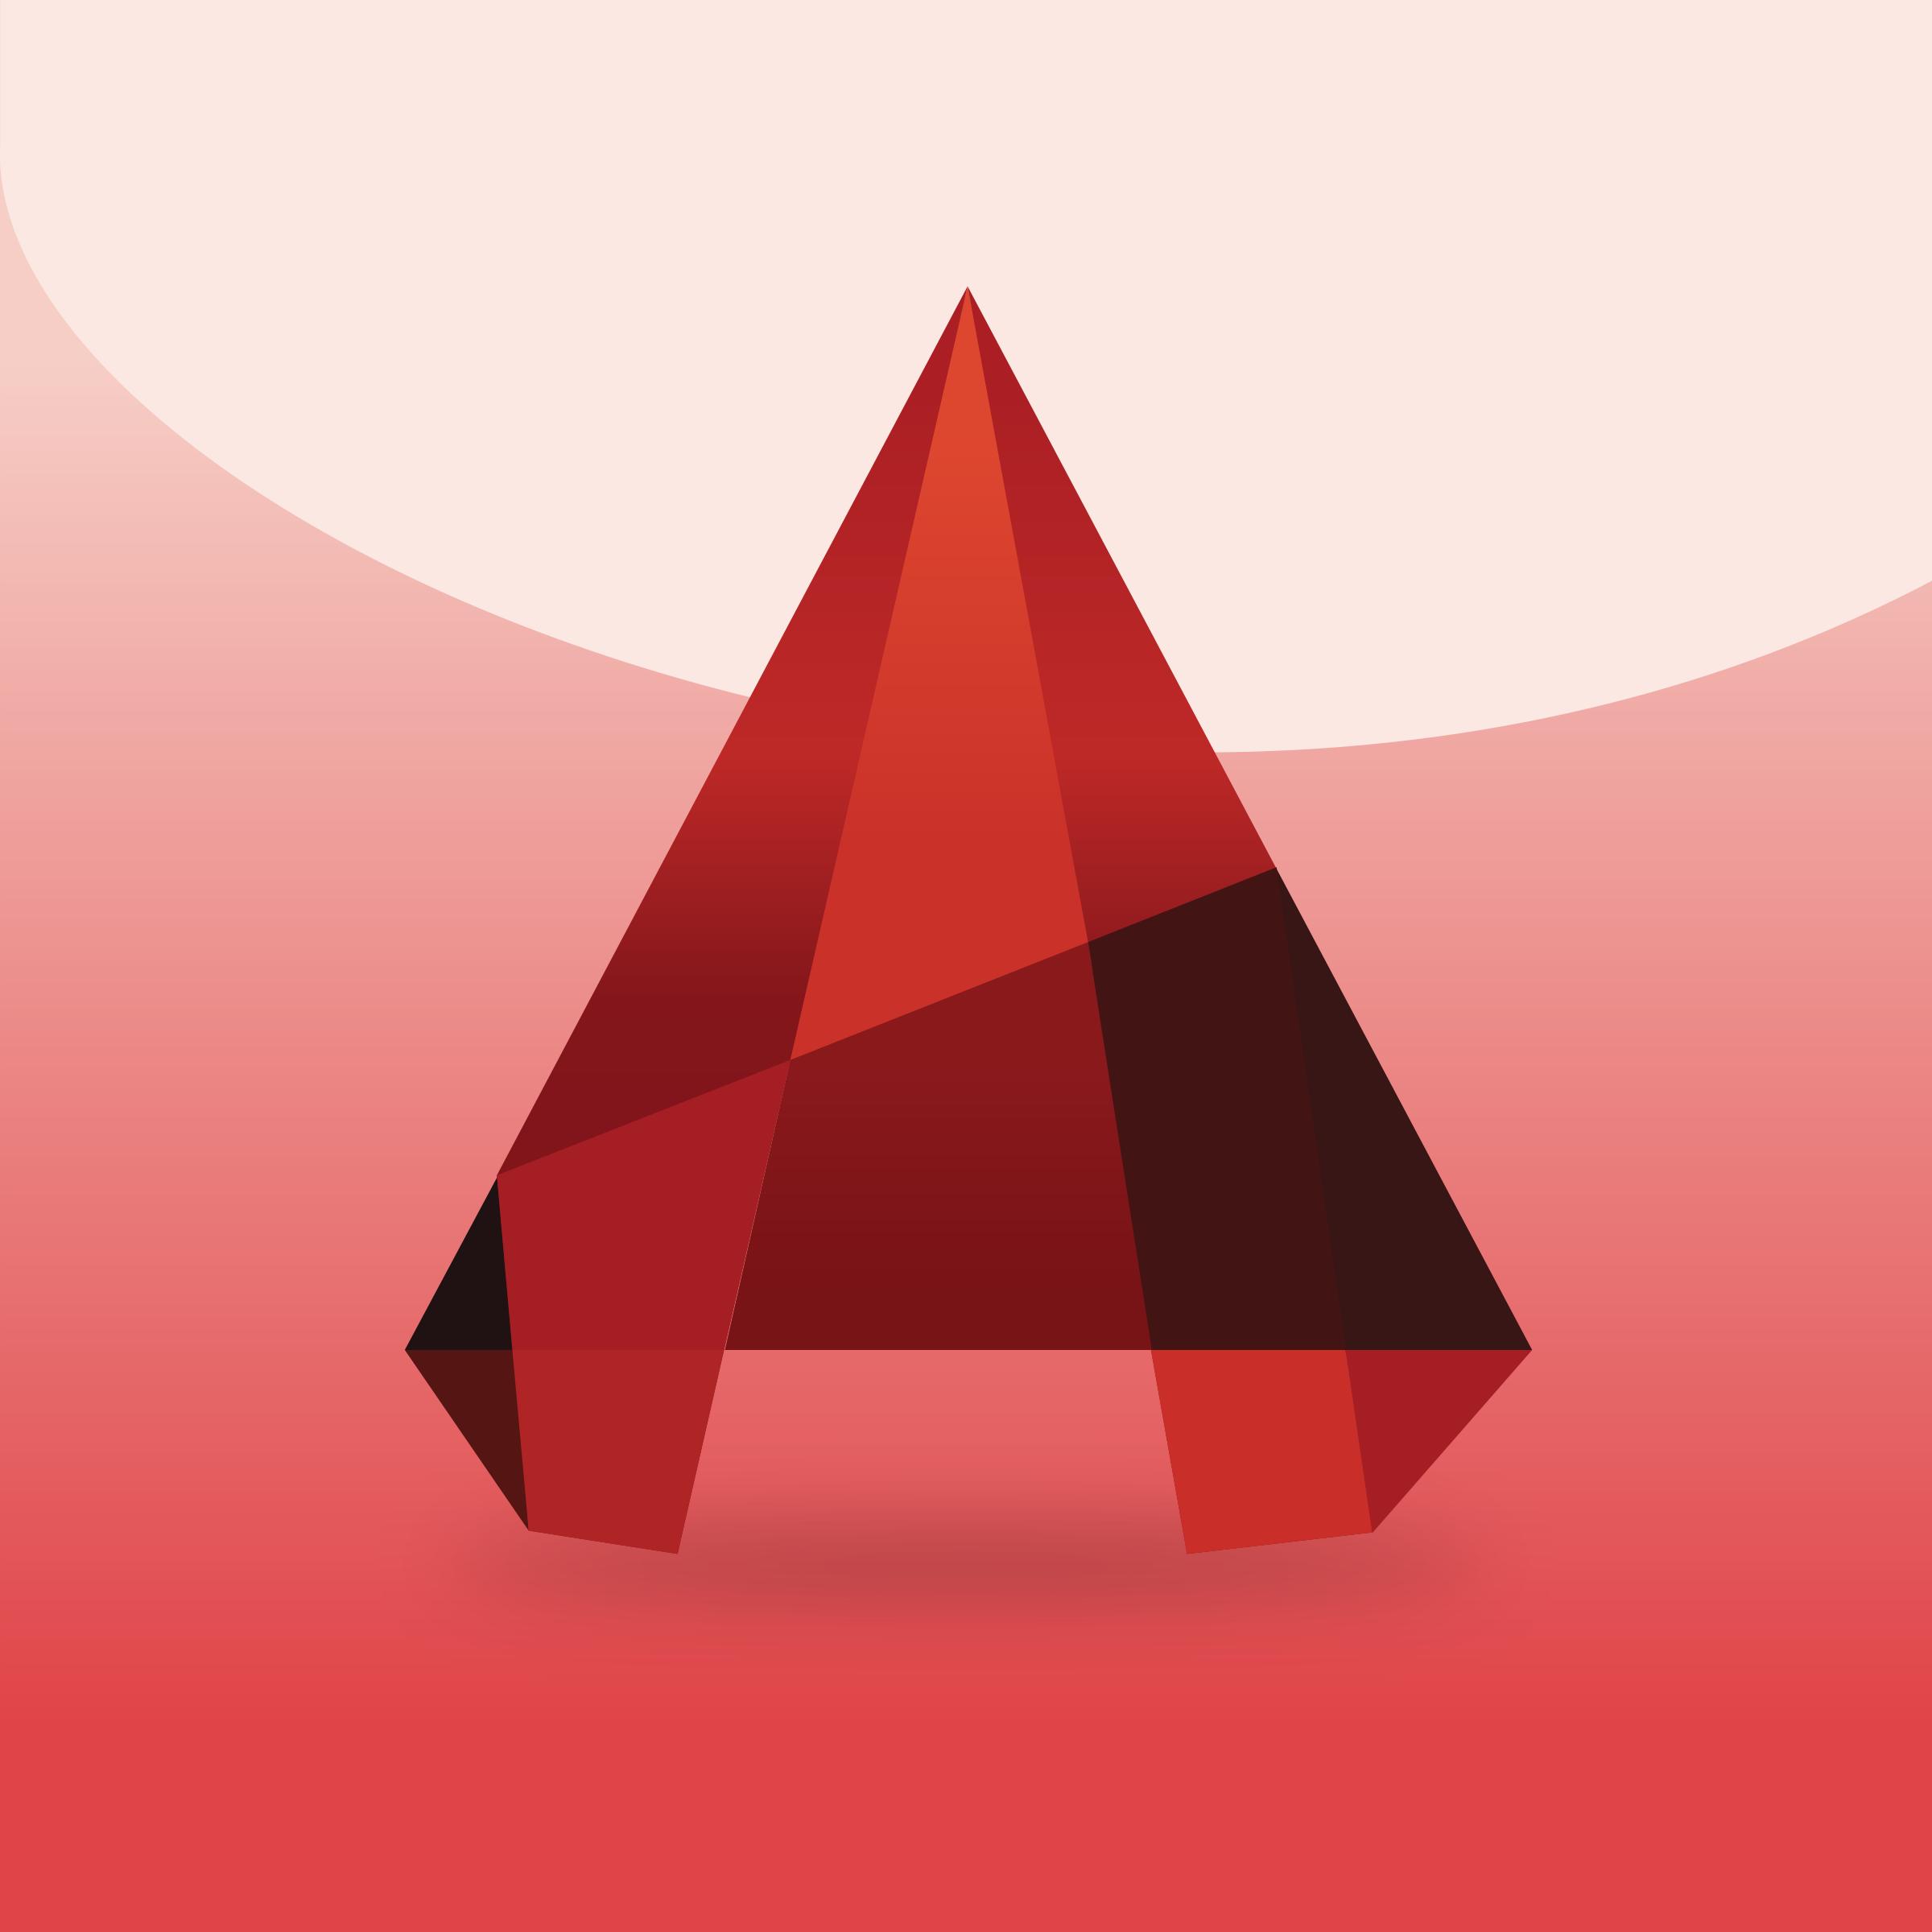 Autocad 2016 Icon Logo PNG Transparent & SVG Vector.